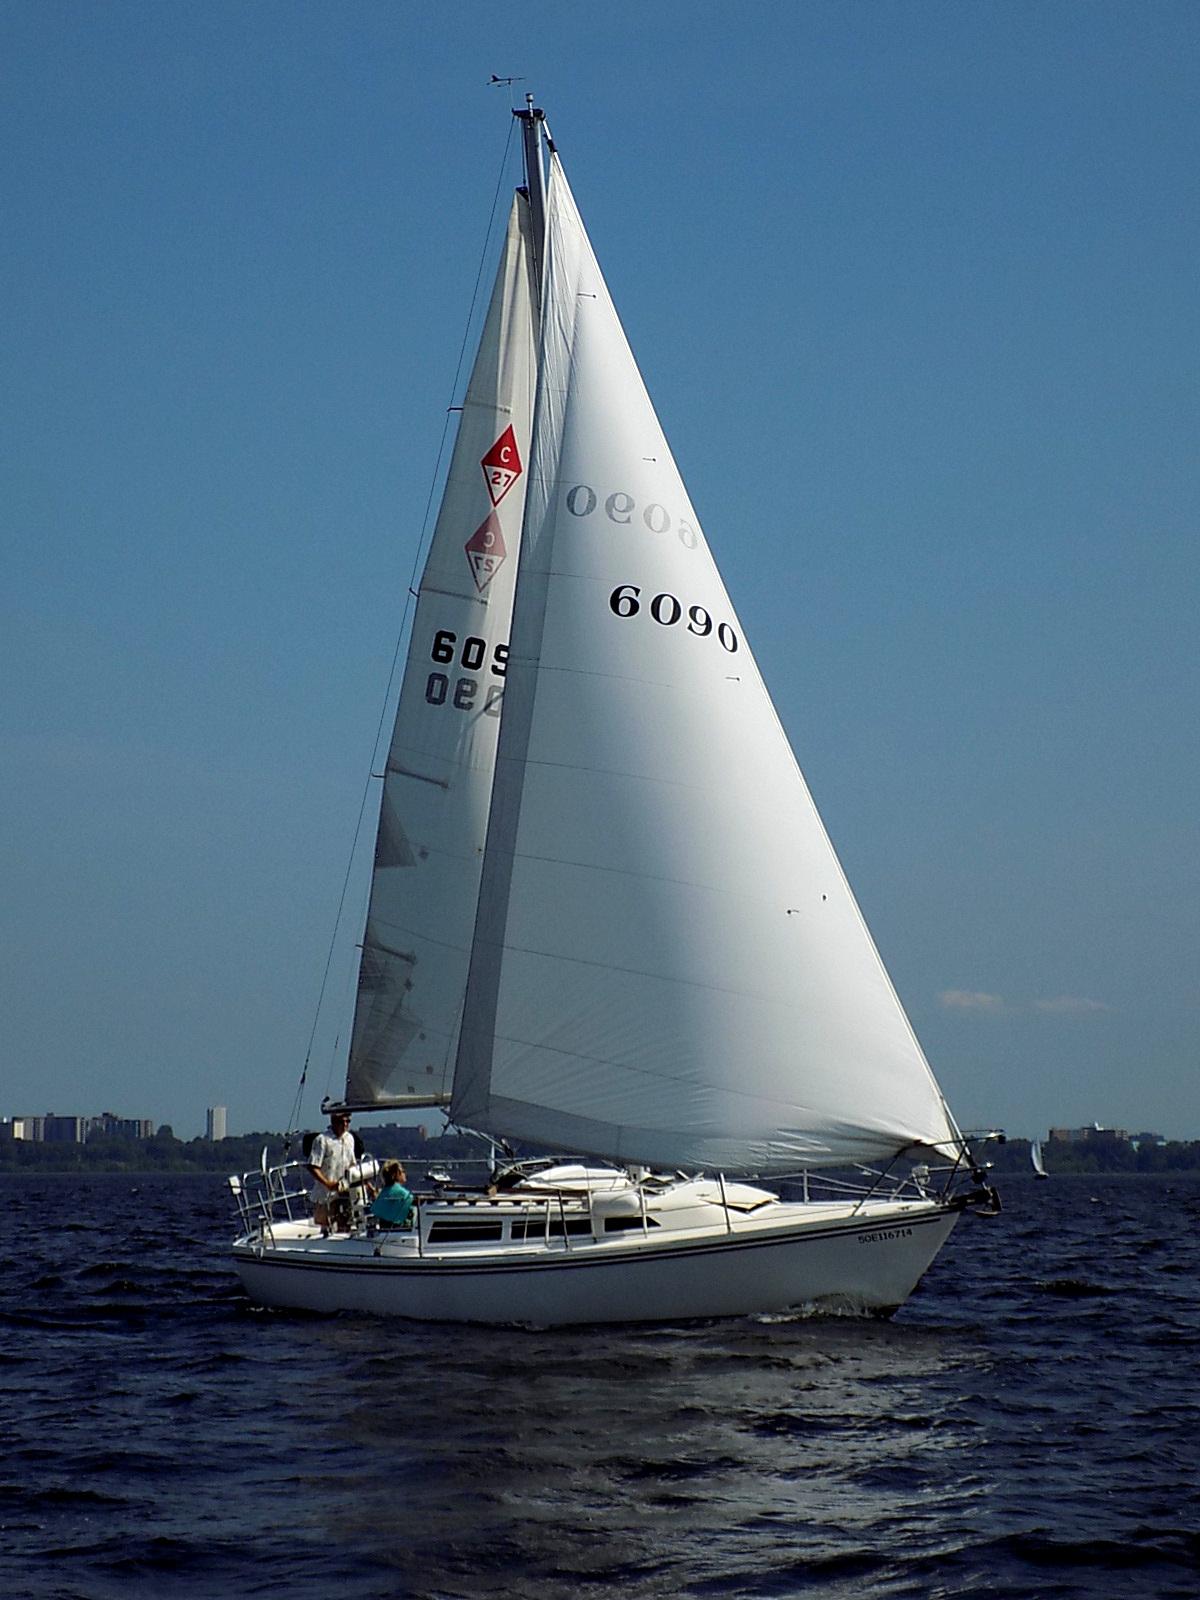 File:Catalina 27 sailboat 3766 jpg - Wikipedia